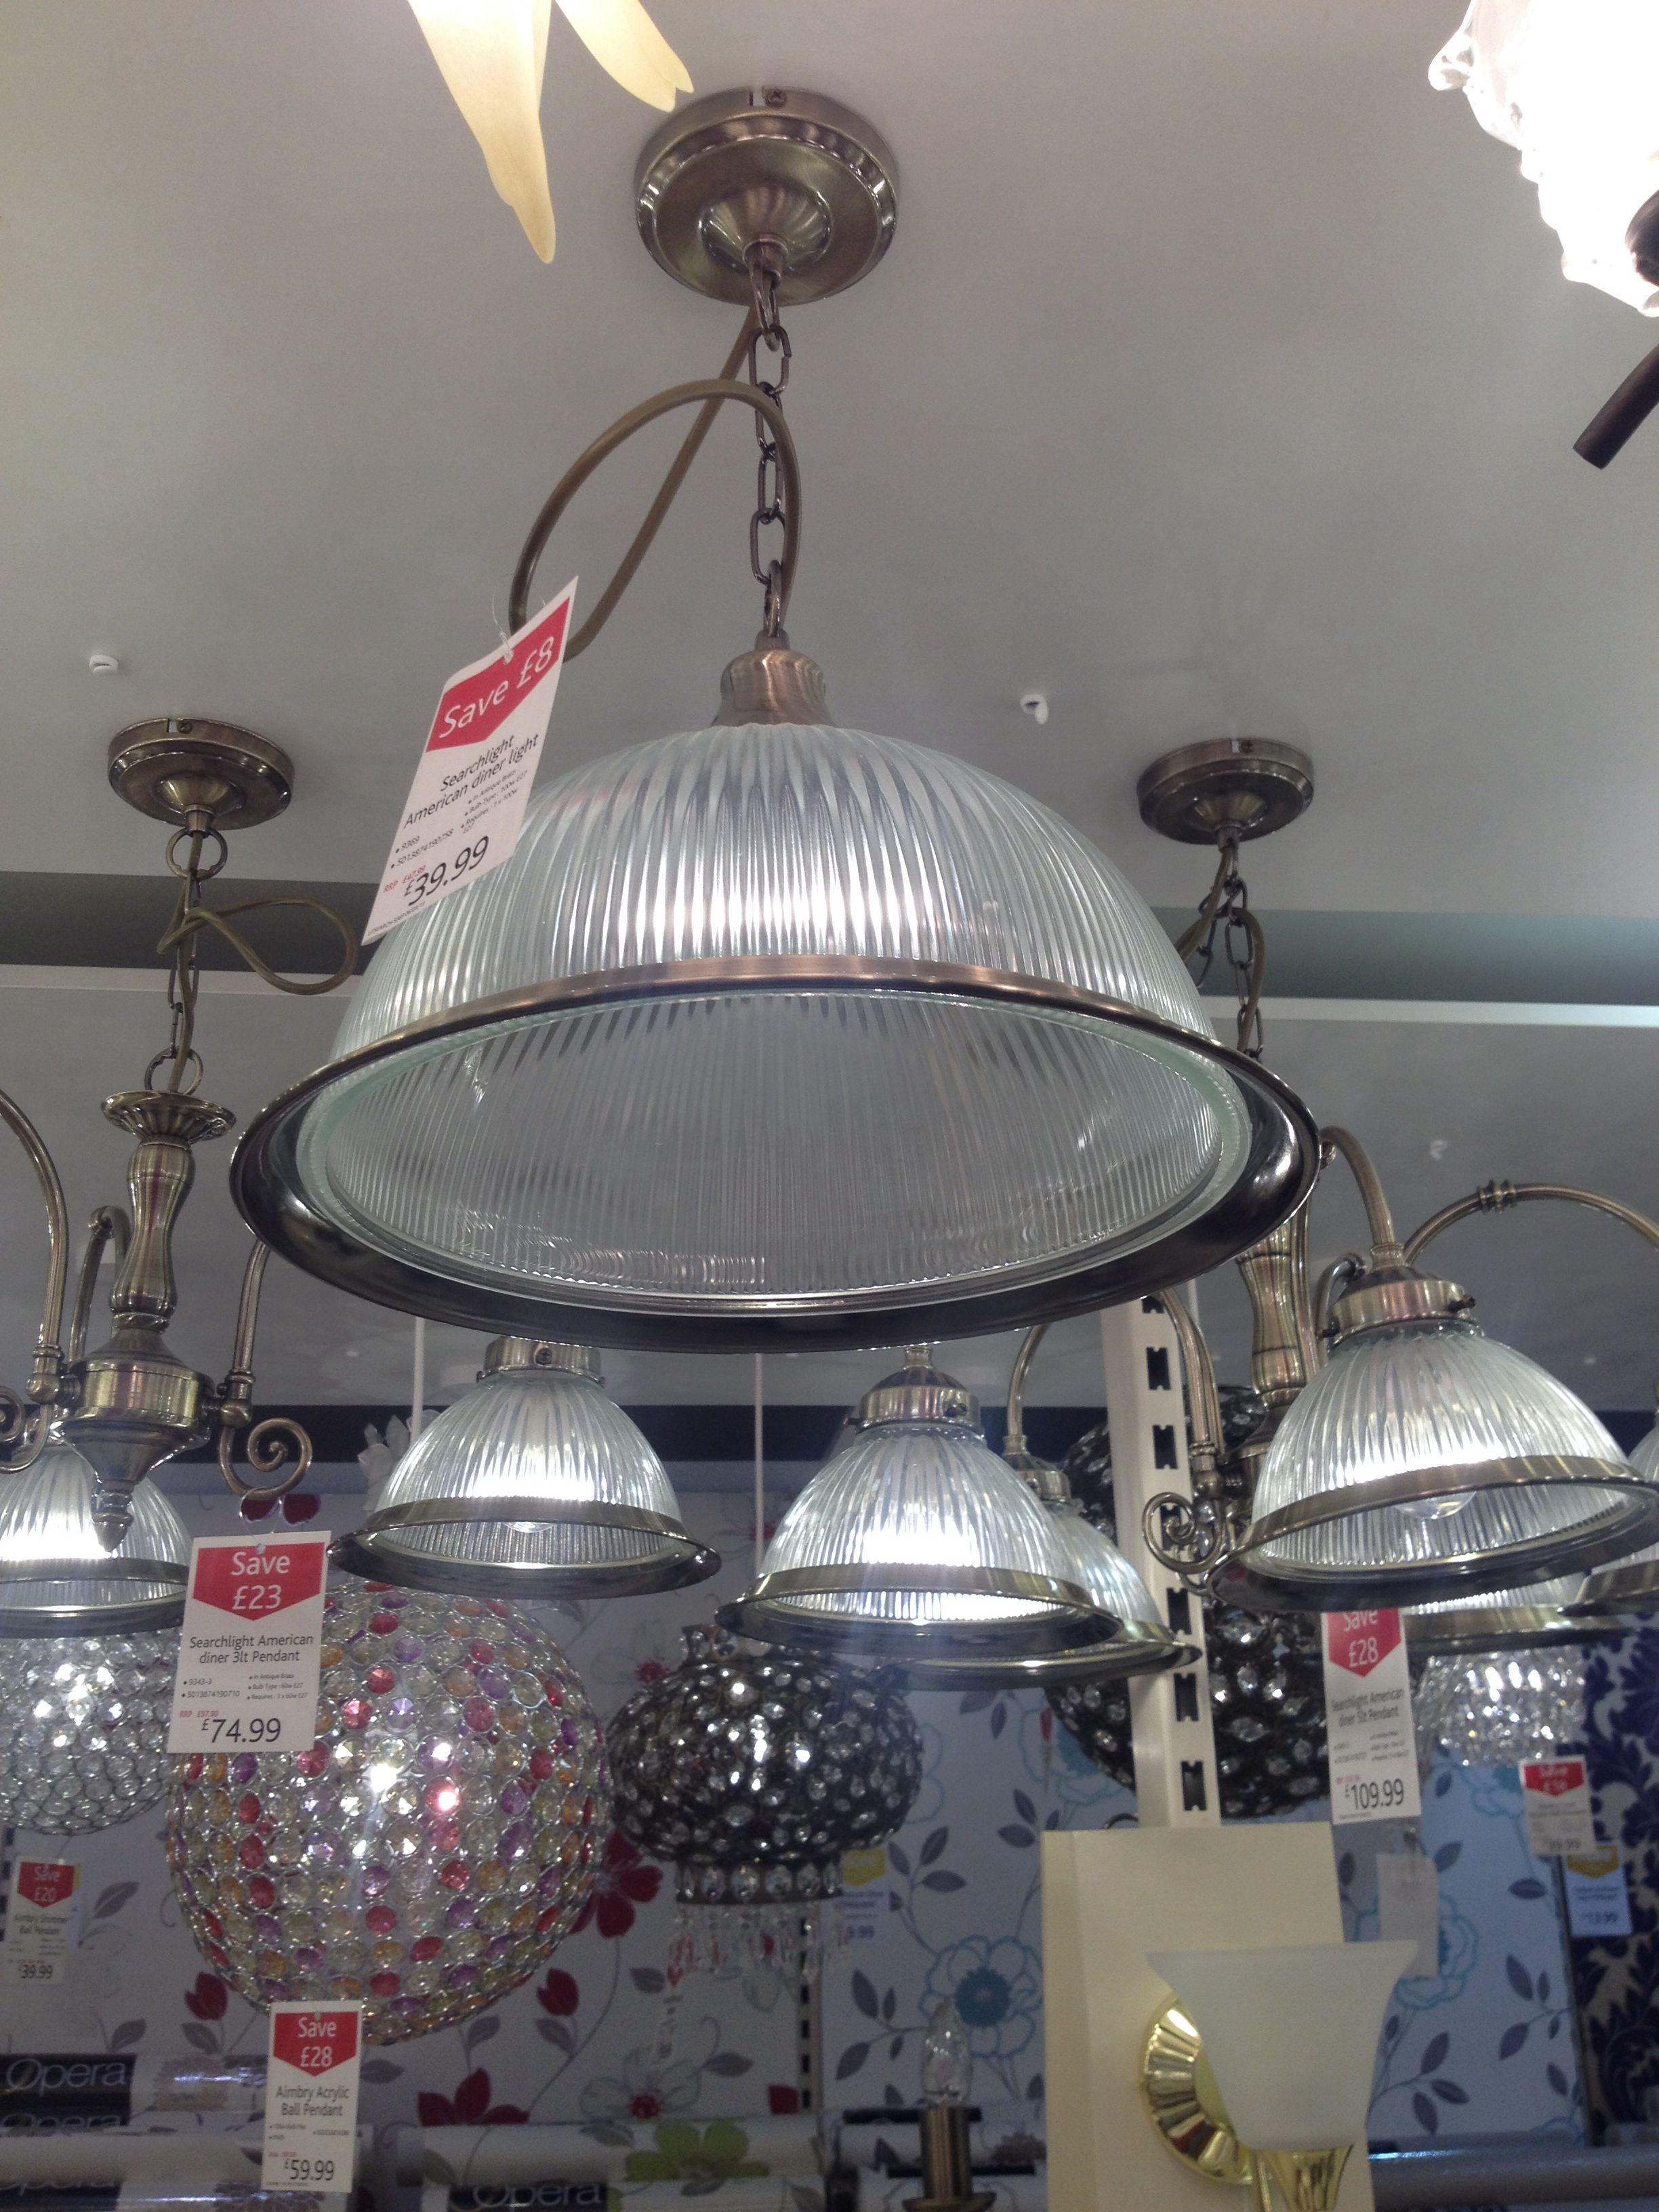 dining room light shade in groups of three   lighting   Pinterest ...